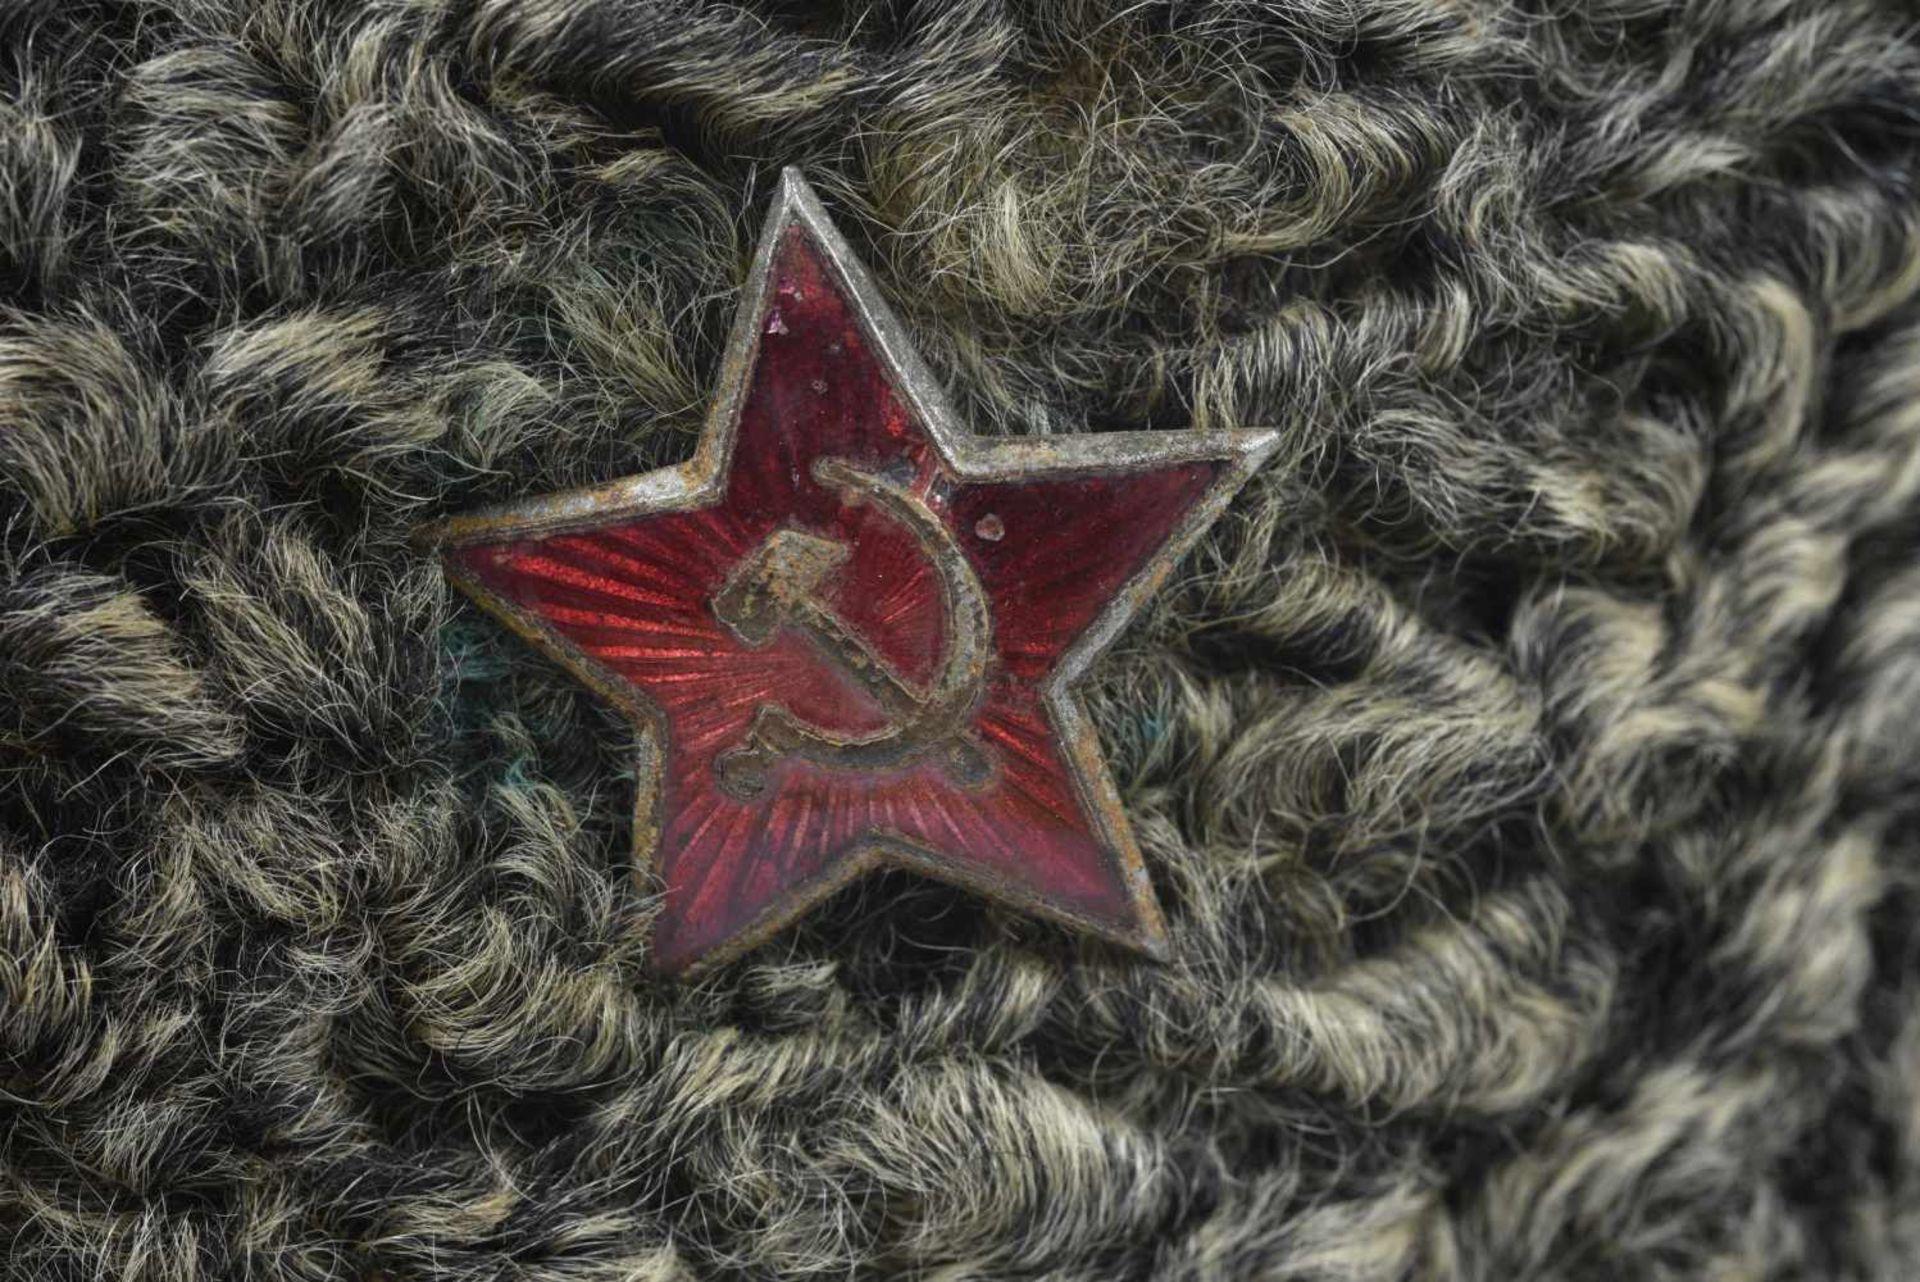 Ushanka en astrakan pour officier. Avec étoile rouge. Portée. Taille 57 environ. Ushanka in - Bild 4 aus 4